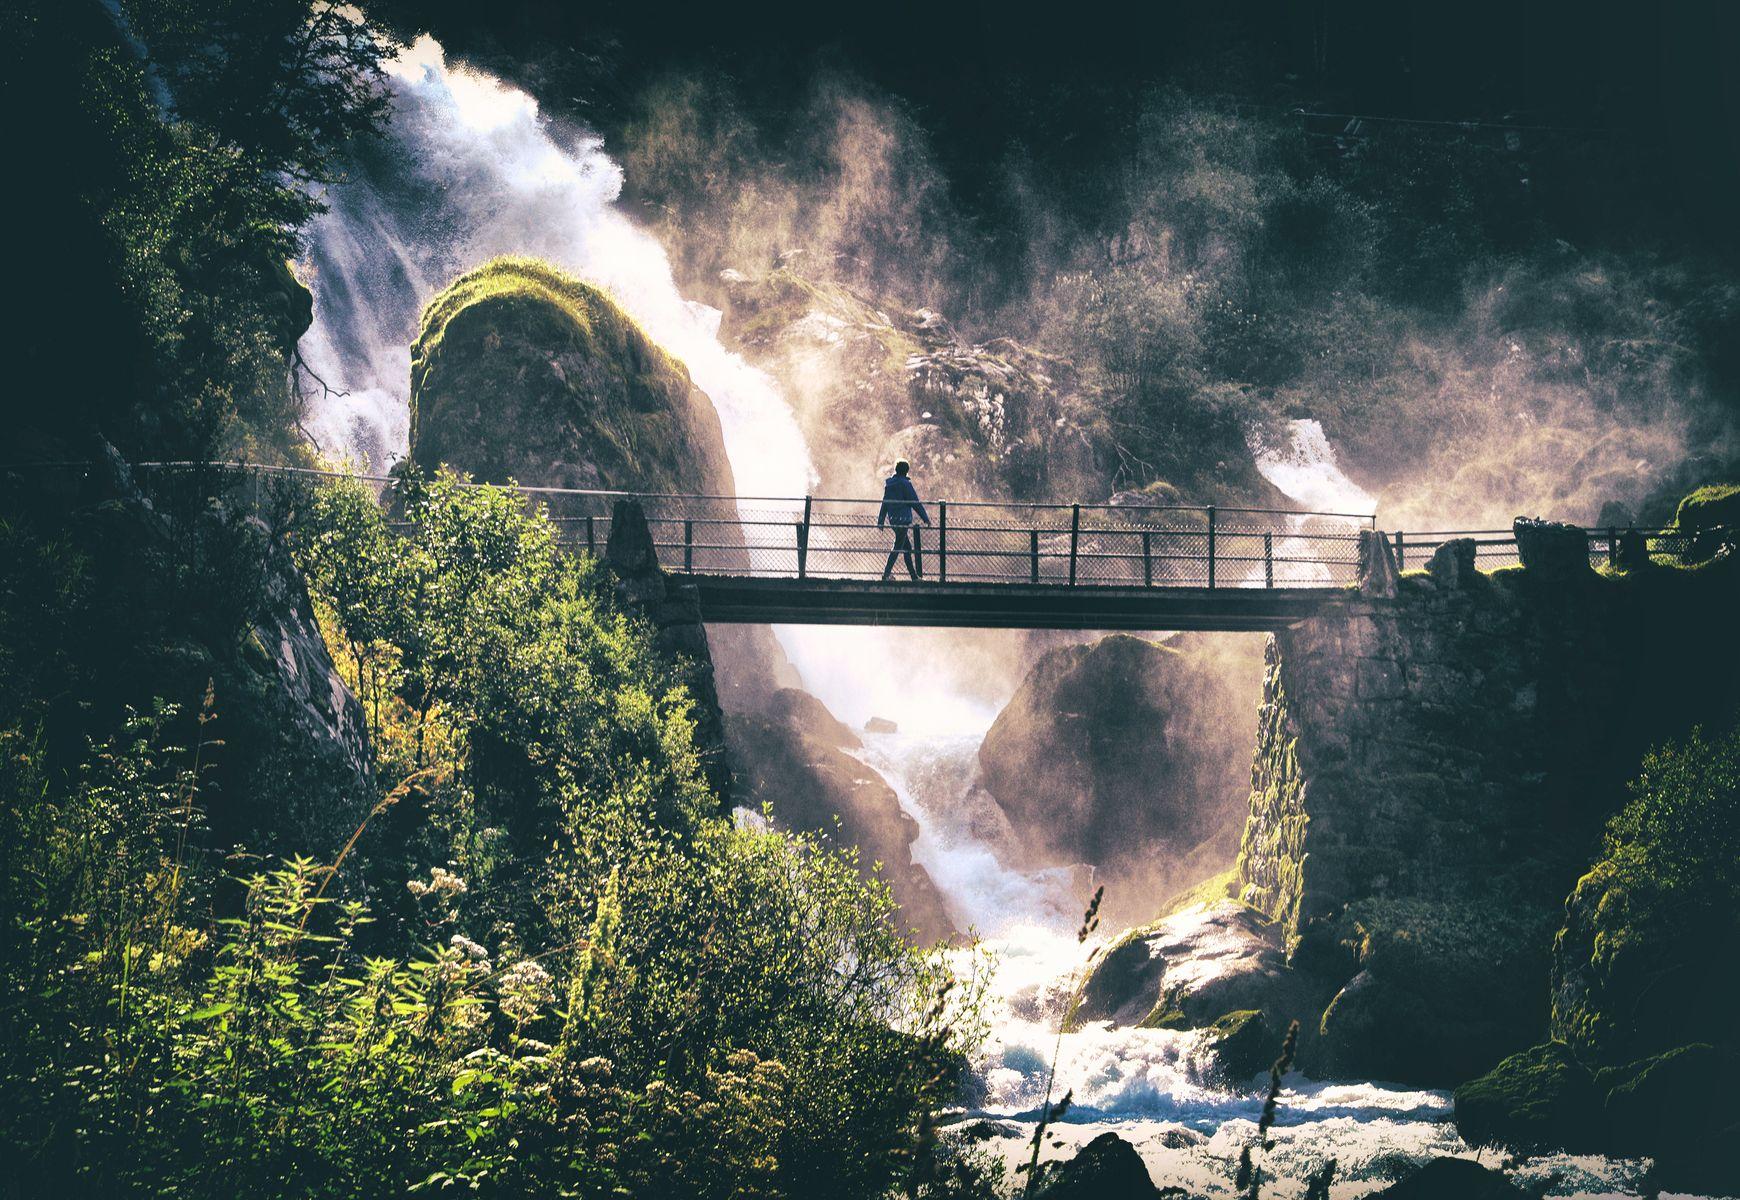 Šetnja pored vodopada (Waterfall walk), Srdjan Kis Bicskei